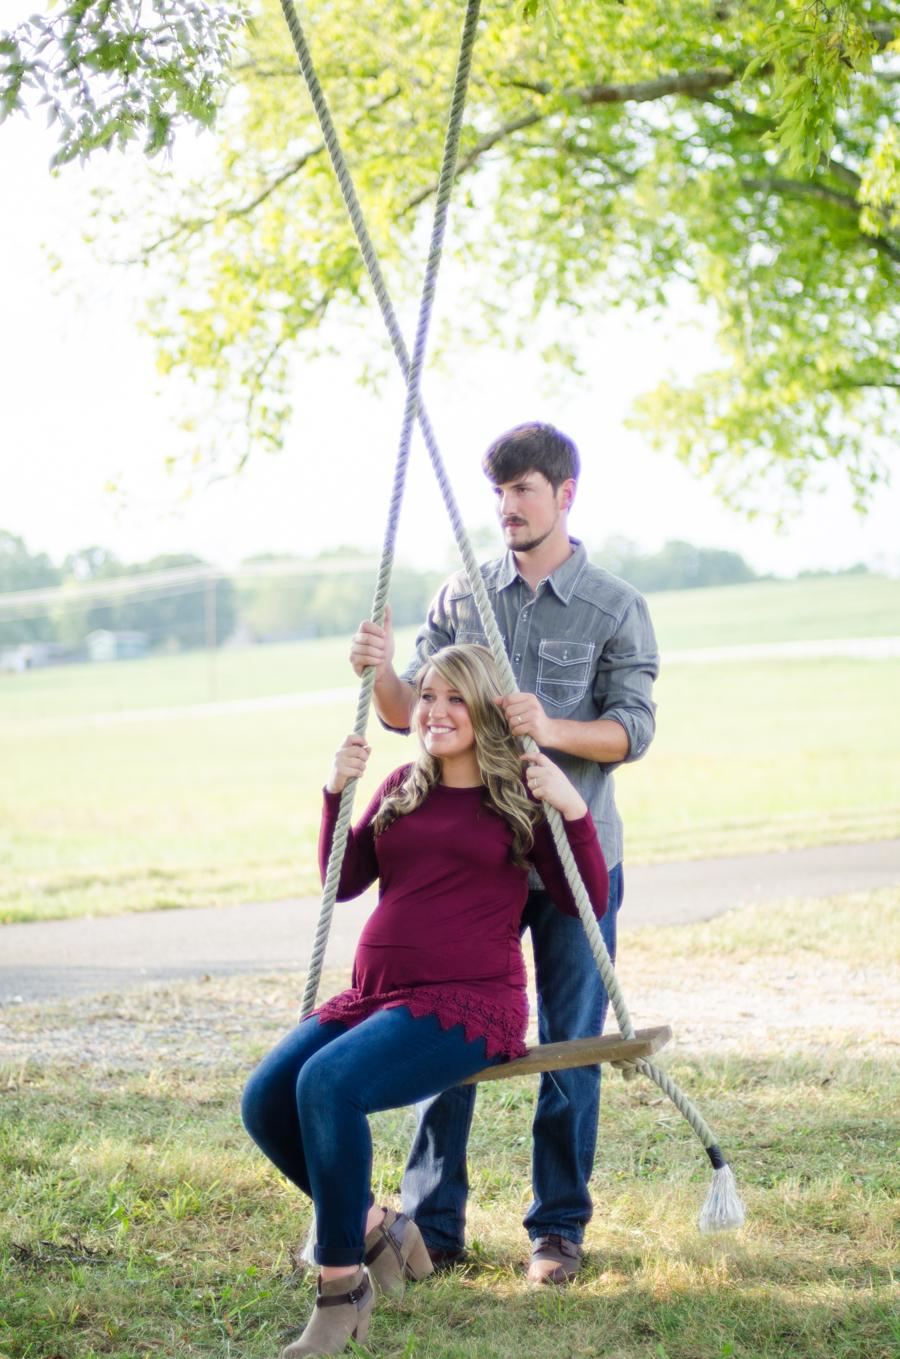 Cody & Kayrin Duke Maternity Session-56.jpg